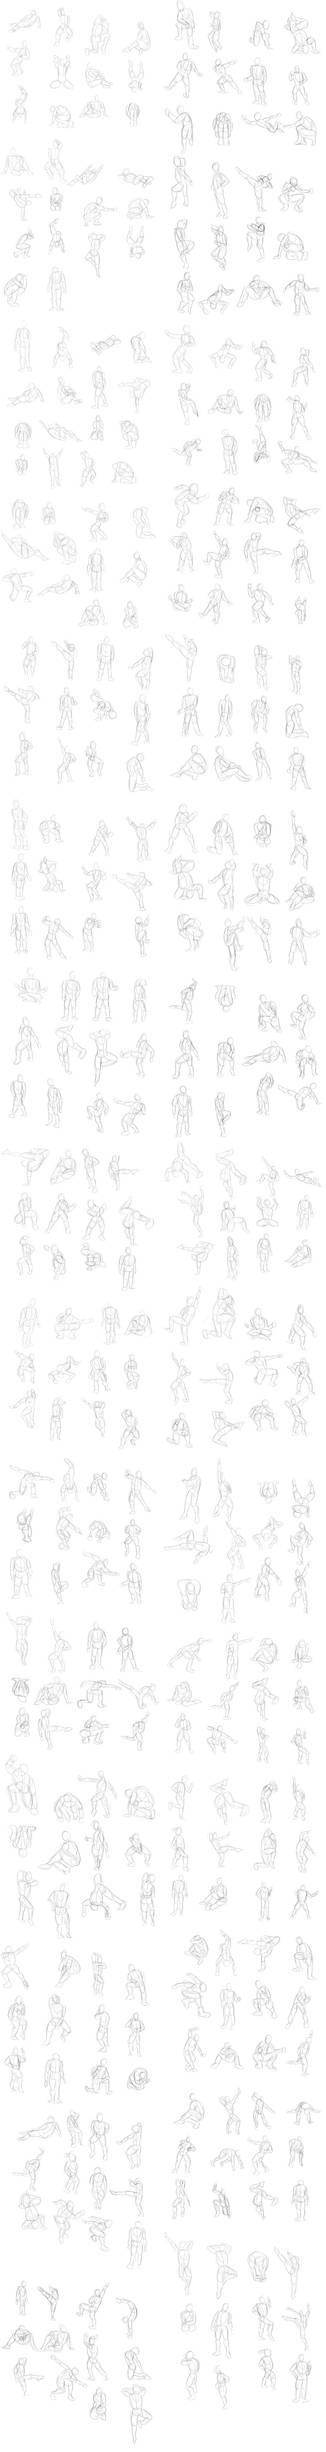 September 2018 sketchdump